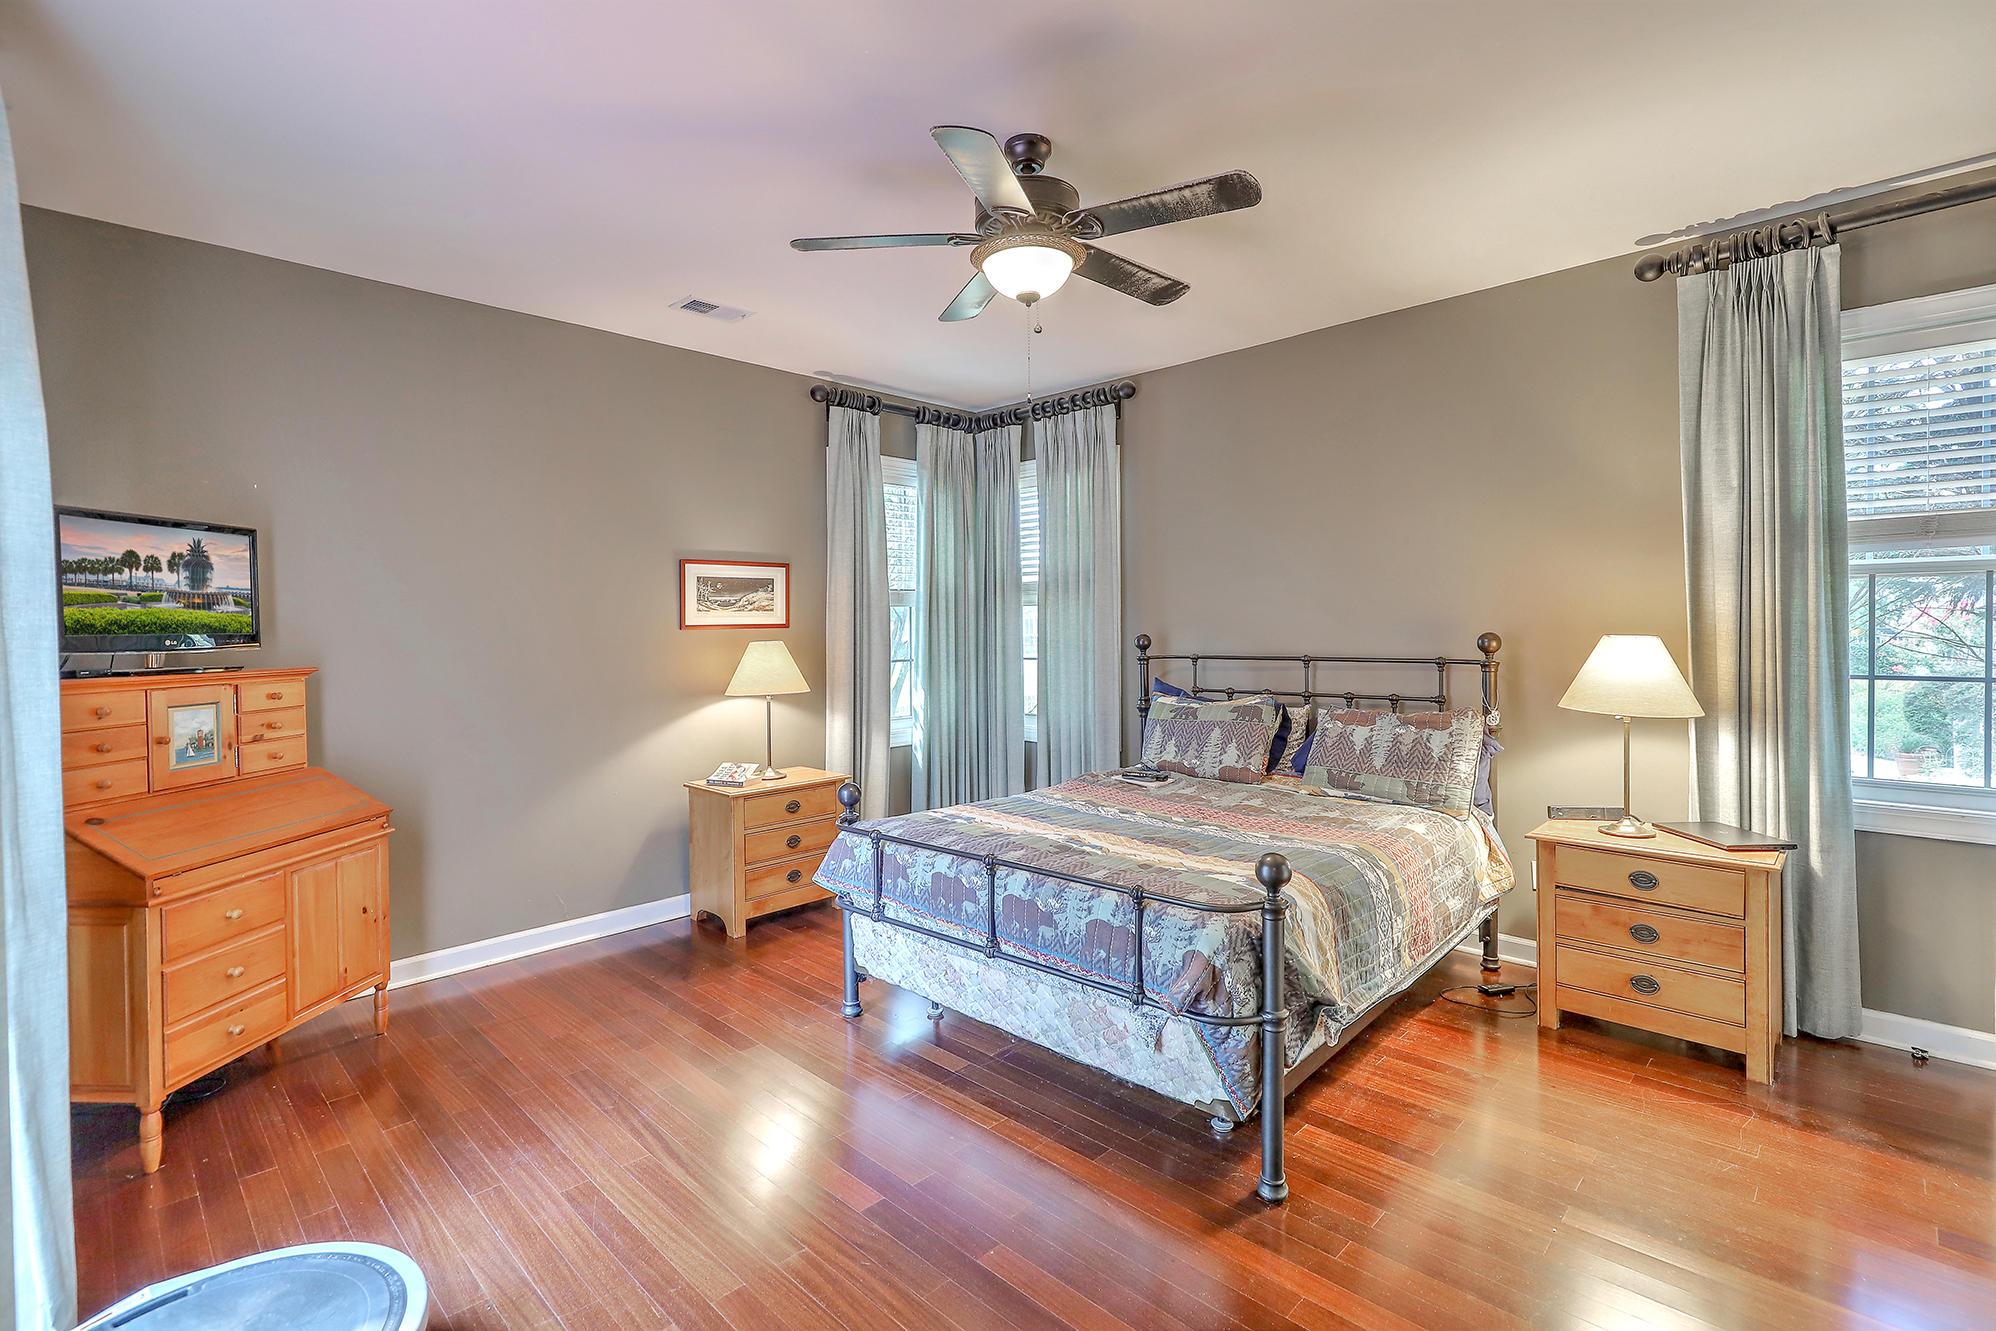 Seaside Farms Homes For Sale - 1244 Palmetto Peninsula, Mount Pleasant, SC - 16